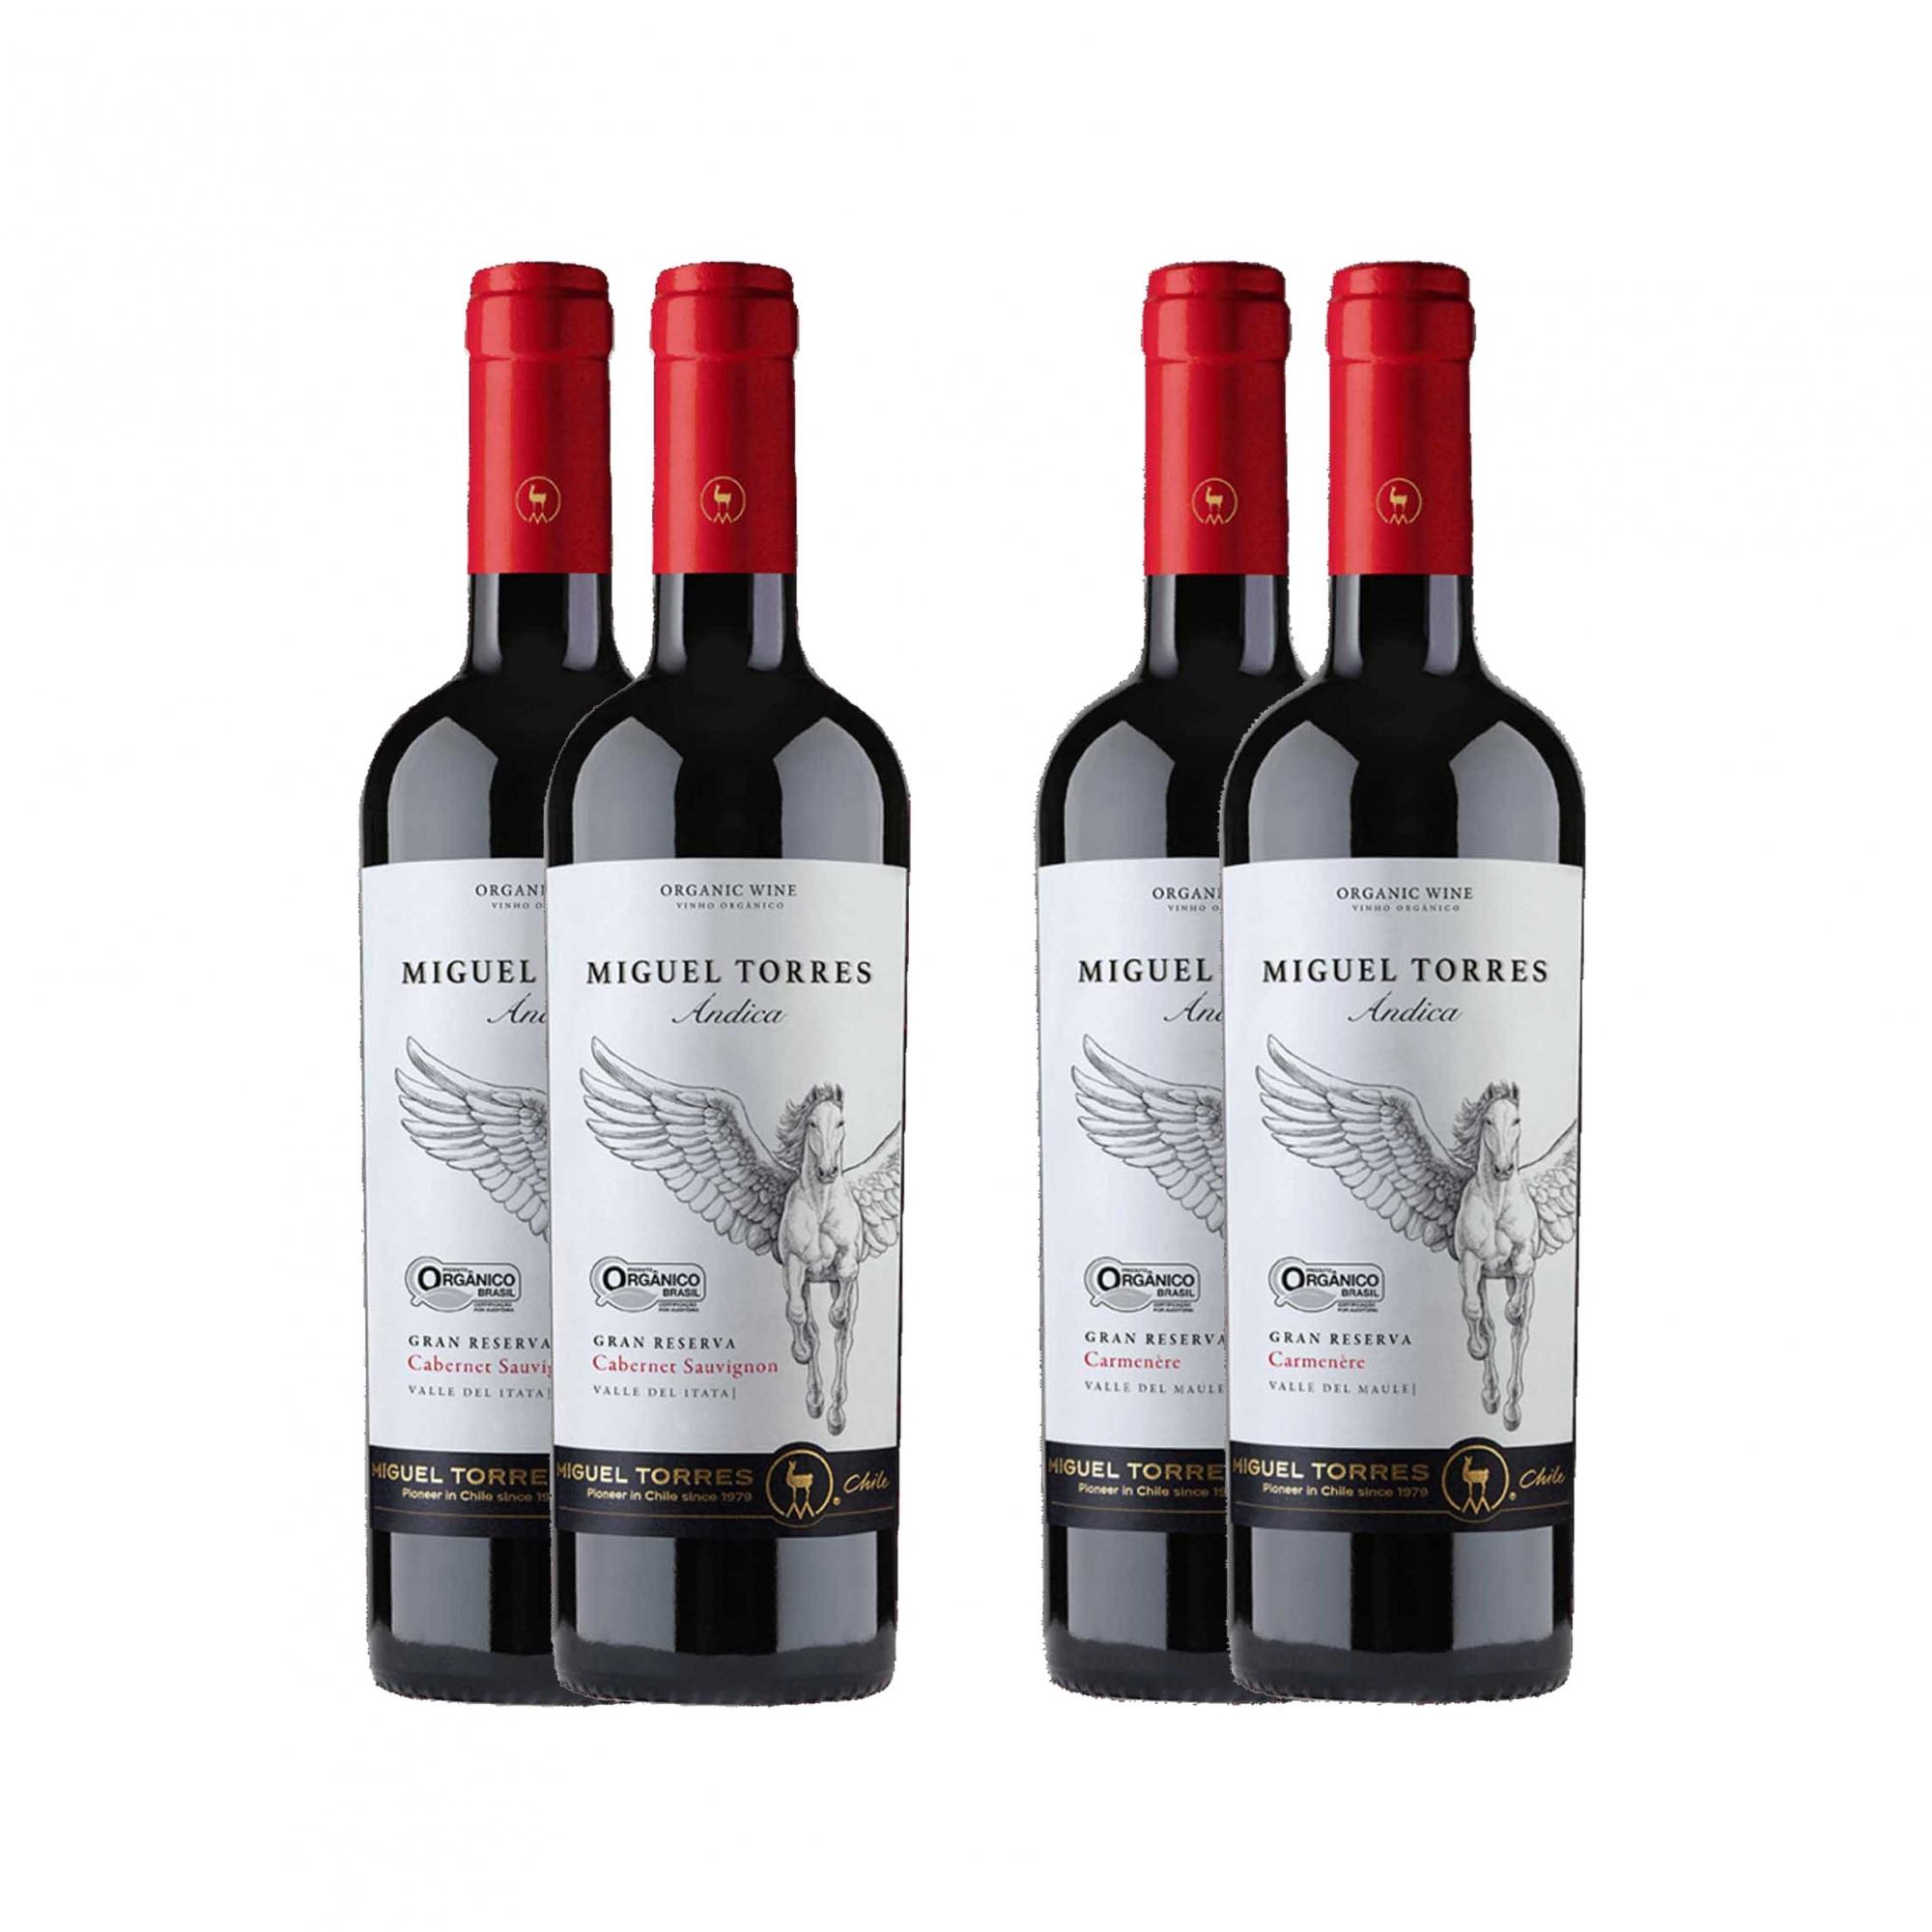 Kit 4x Vinho Tinto Chileno Orgânico Miguel Torres Cabernet Sauvignon e Carmenere 2019